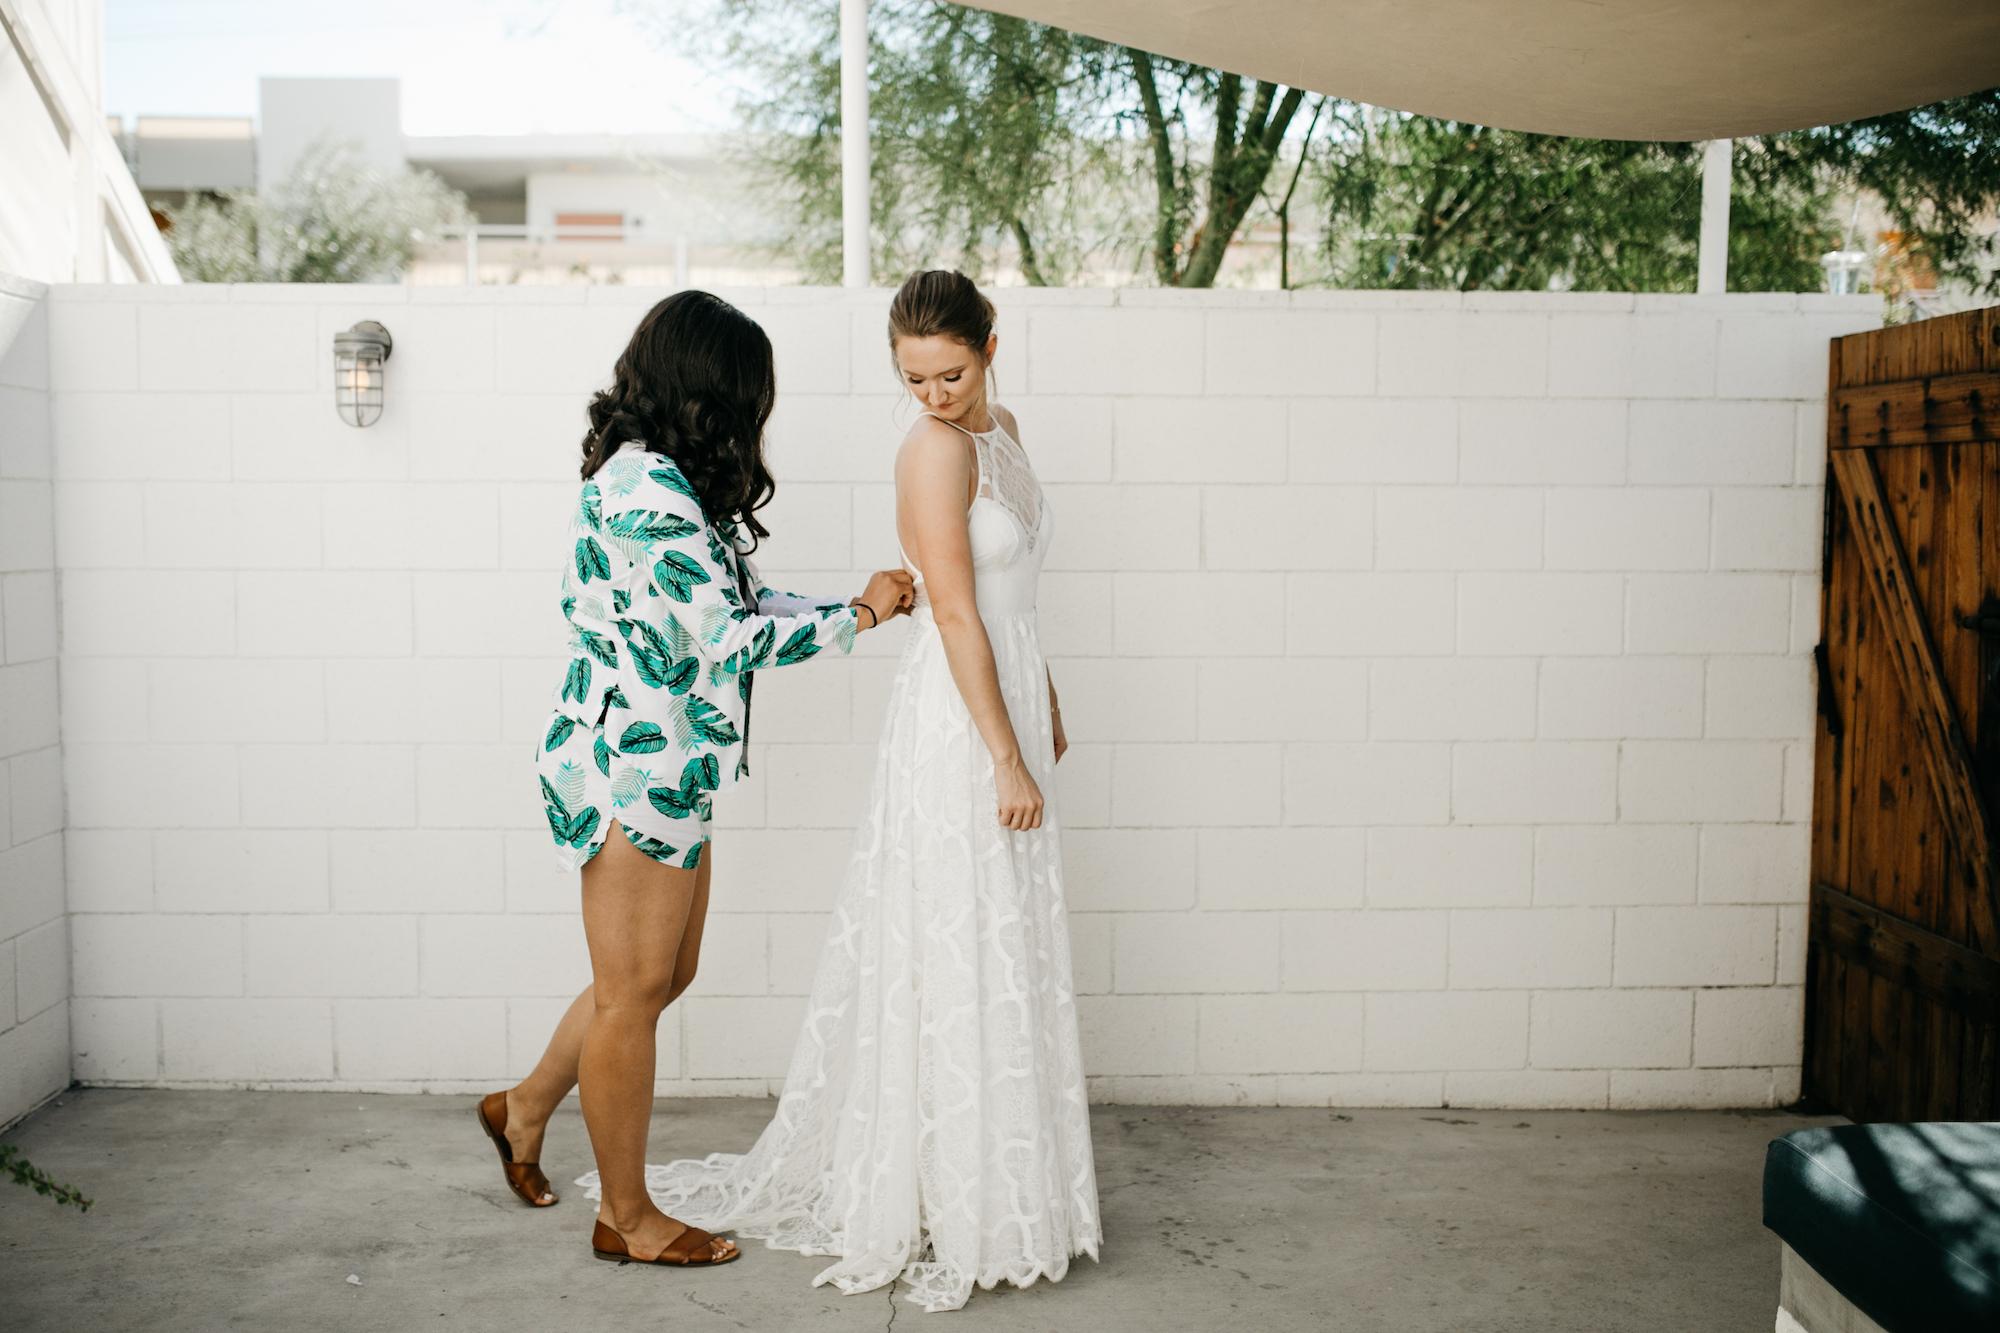 ace-hotel-palm-springs-wedding-photographer174.jpg